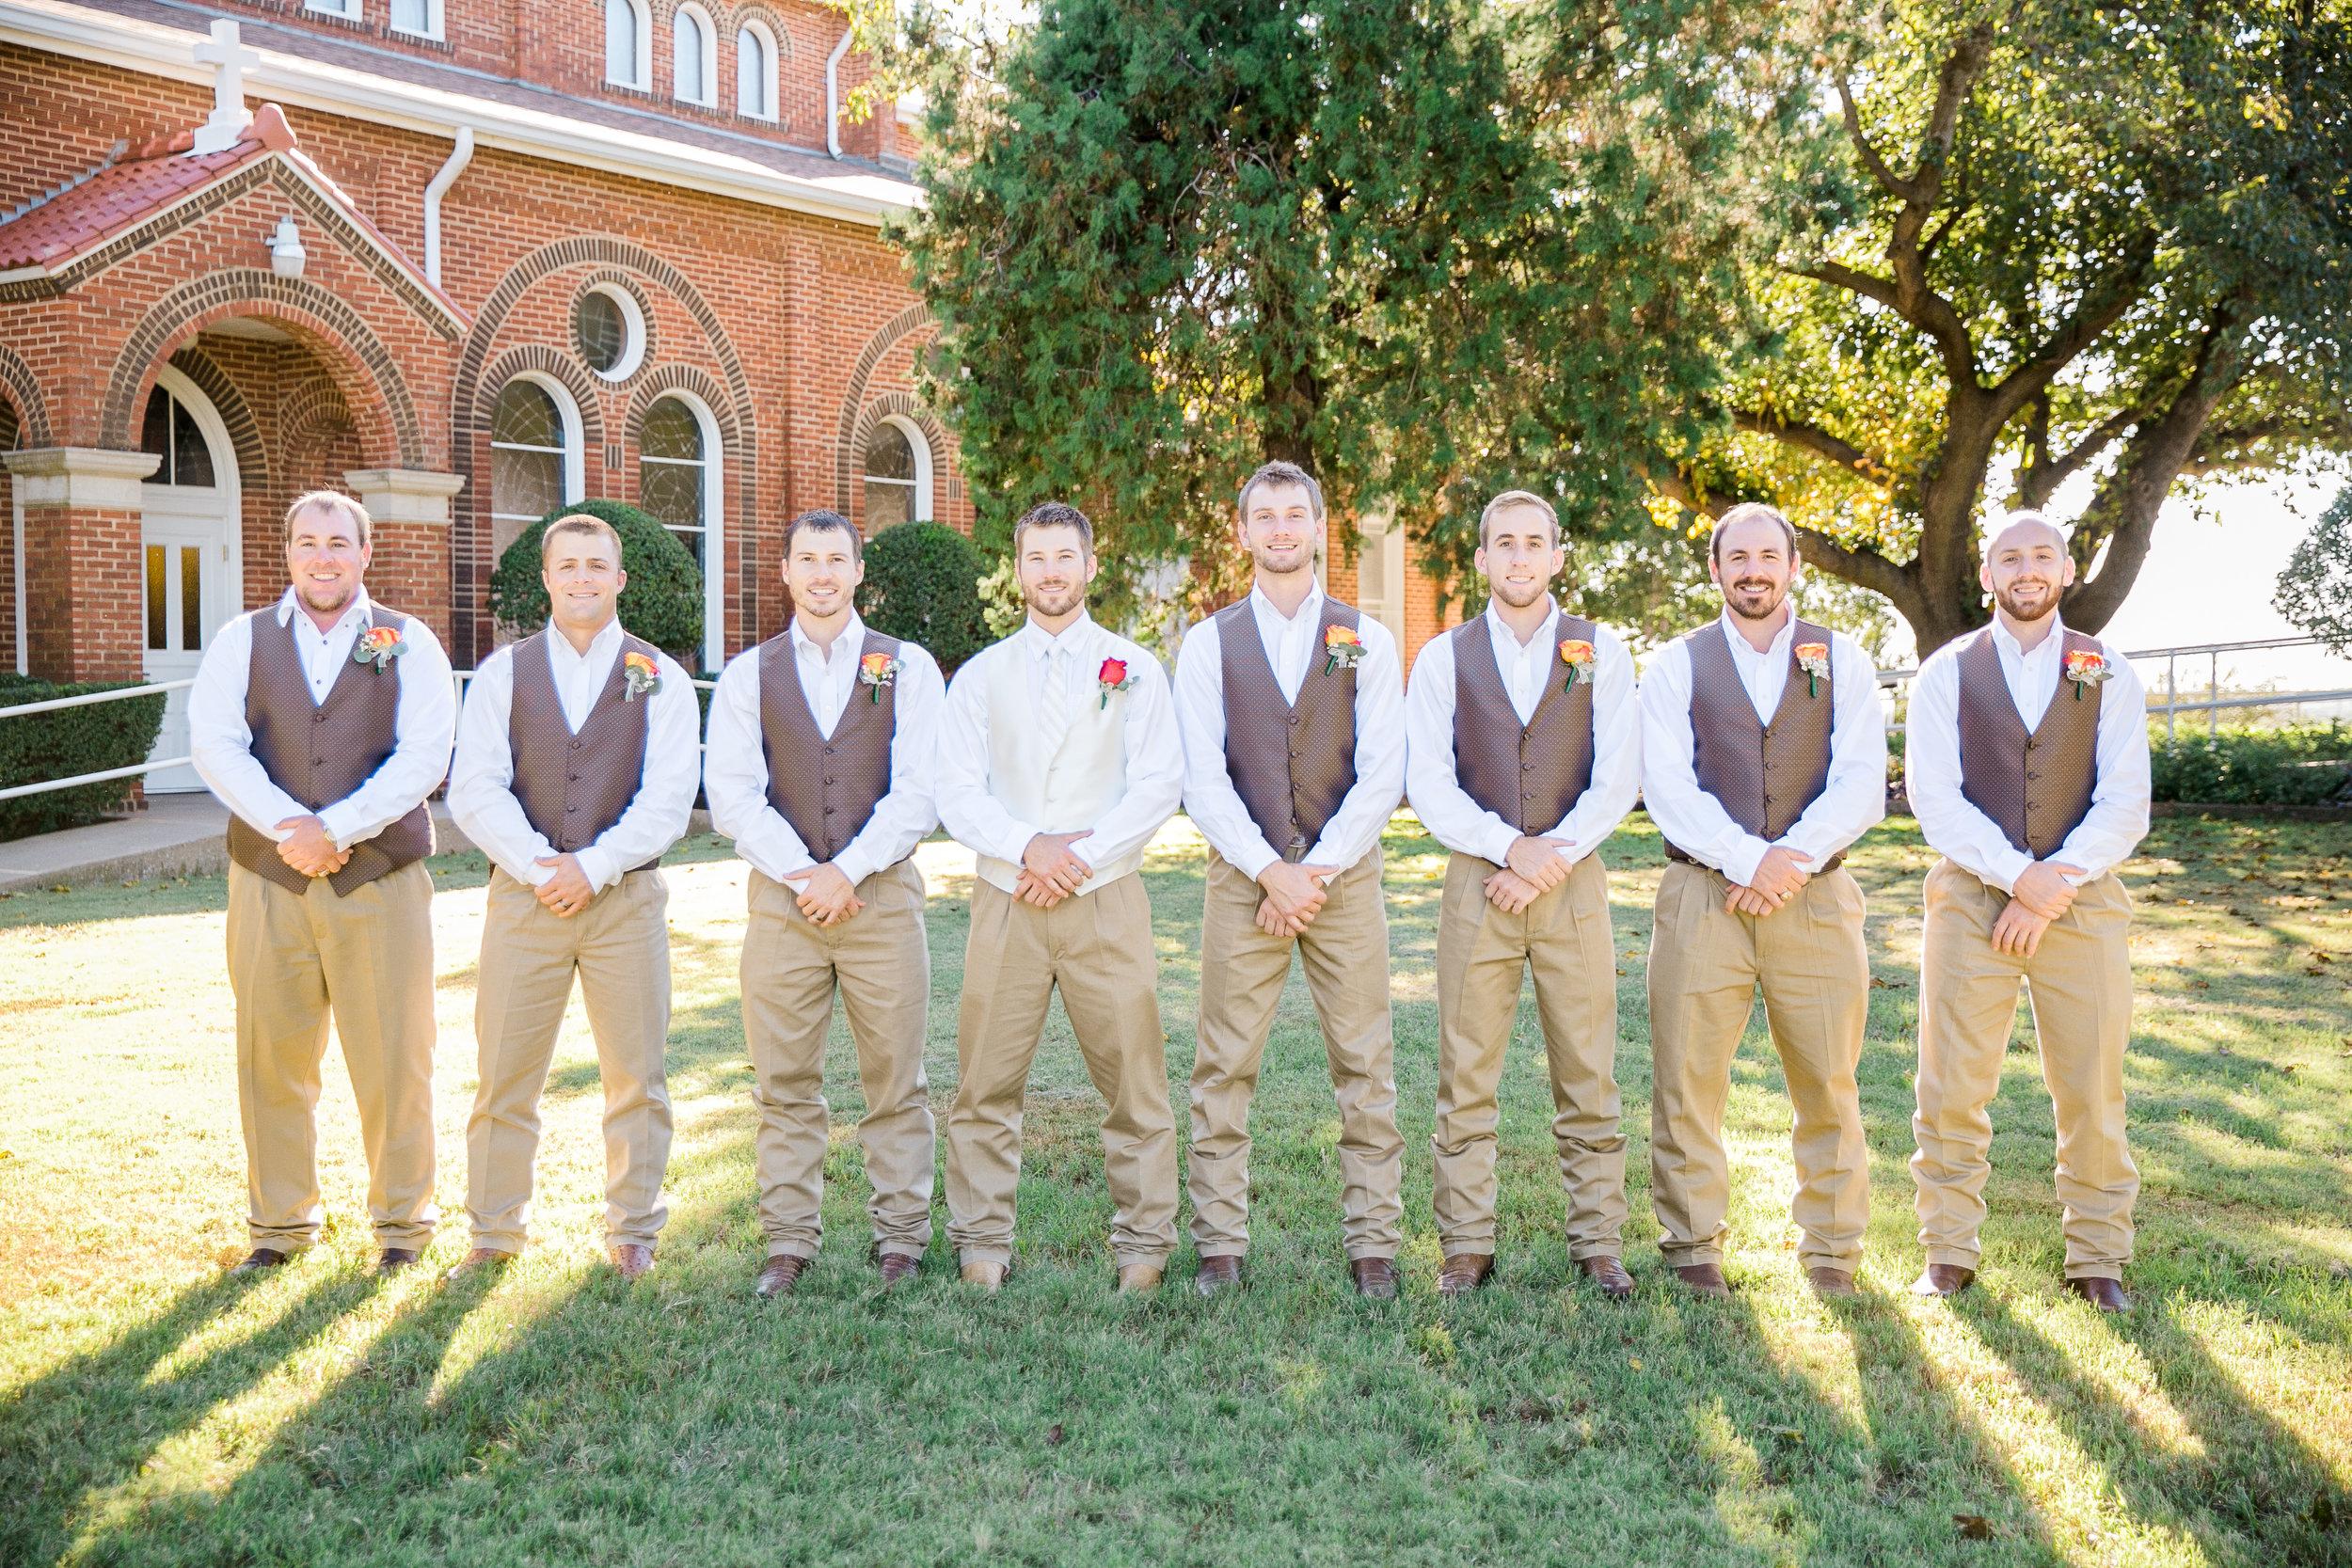 Bailey-Nathan-Windthorst-Texas-Wedding-027.jpg